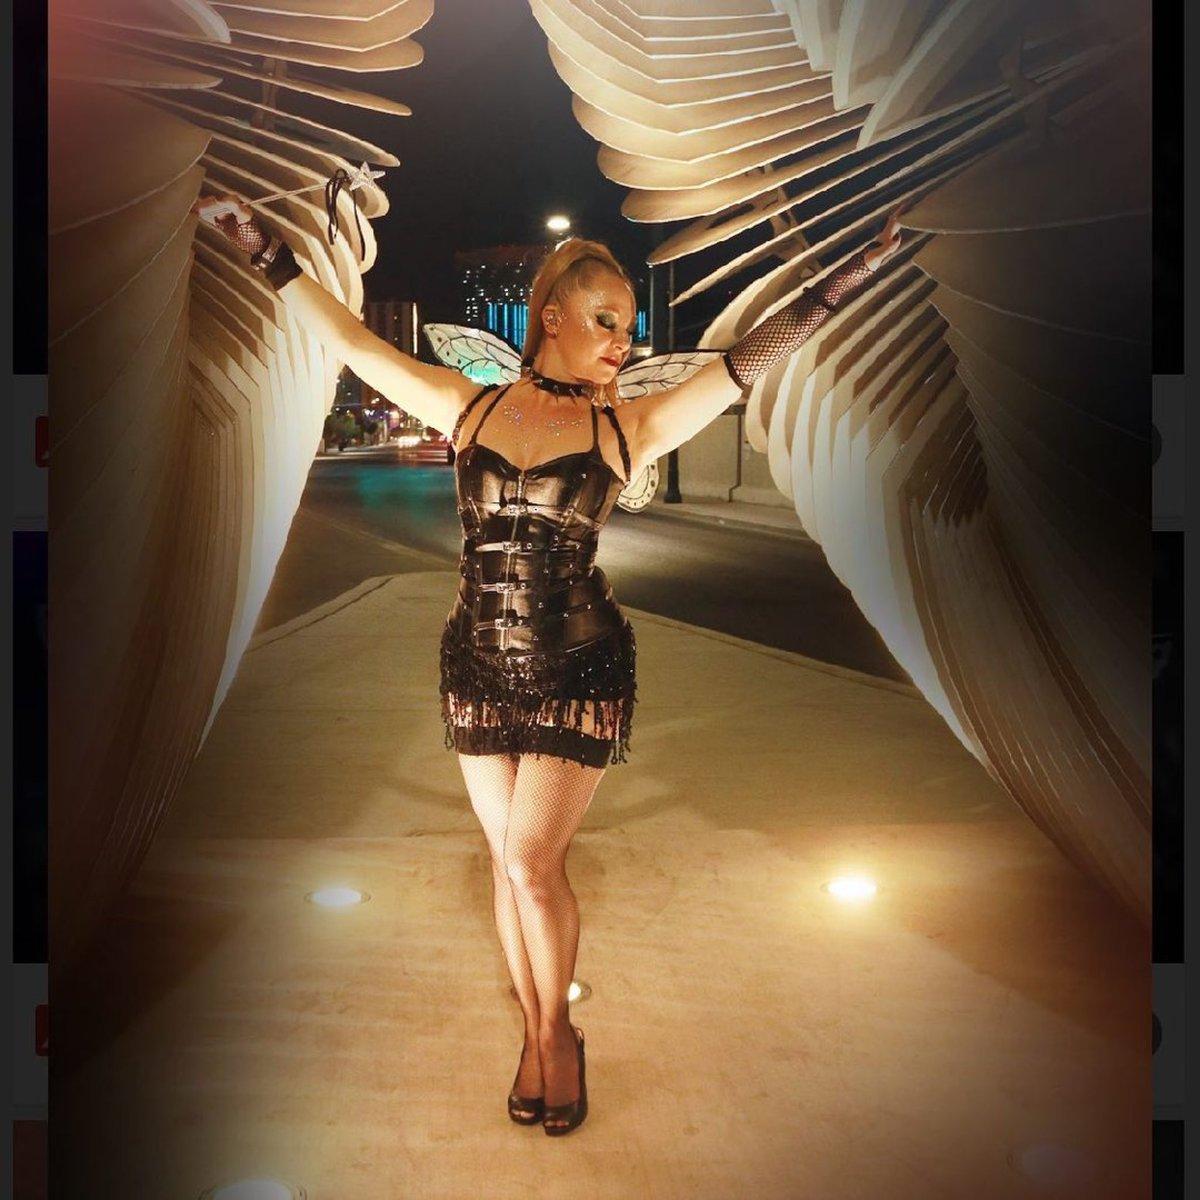 TINKERBELL'S DARKER SIDE 🖤 : BABES IN HEELS:  BABES AFTER DARK 💋 : LOVE THIS PIC 🧚🏼 : #halloween2020 #tinkerbell #vegasartsdistrict #dance #dancer #fitnessinstructor #danceinstructor #pilatesinstructor #fitness   #nightphotography #photography #vegasphotographer  #naughty https://t.co/4ygYhI4Aaa